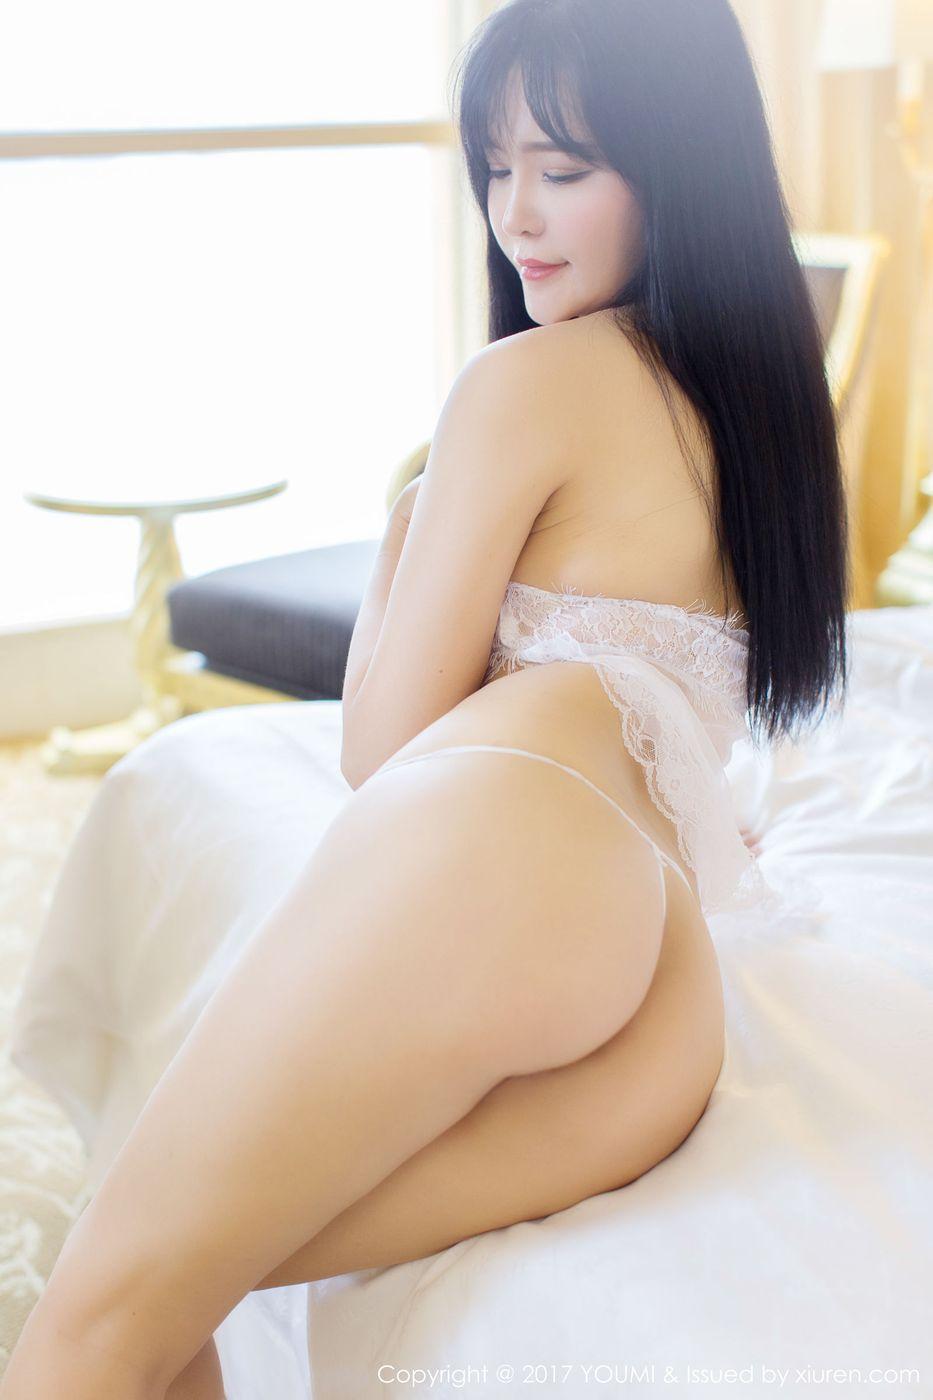 [YOUMI尤蜜荟] 性感女神刘钰儿透视吊裙丰胸美臀诱惑写真 VOL.065